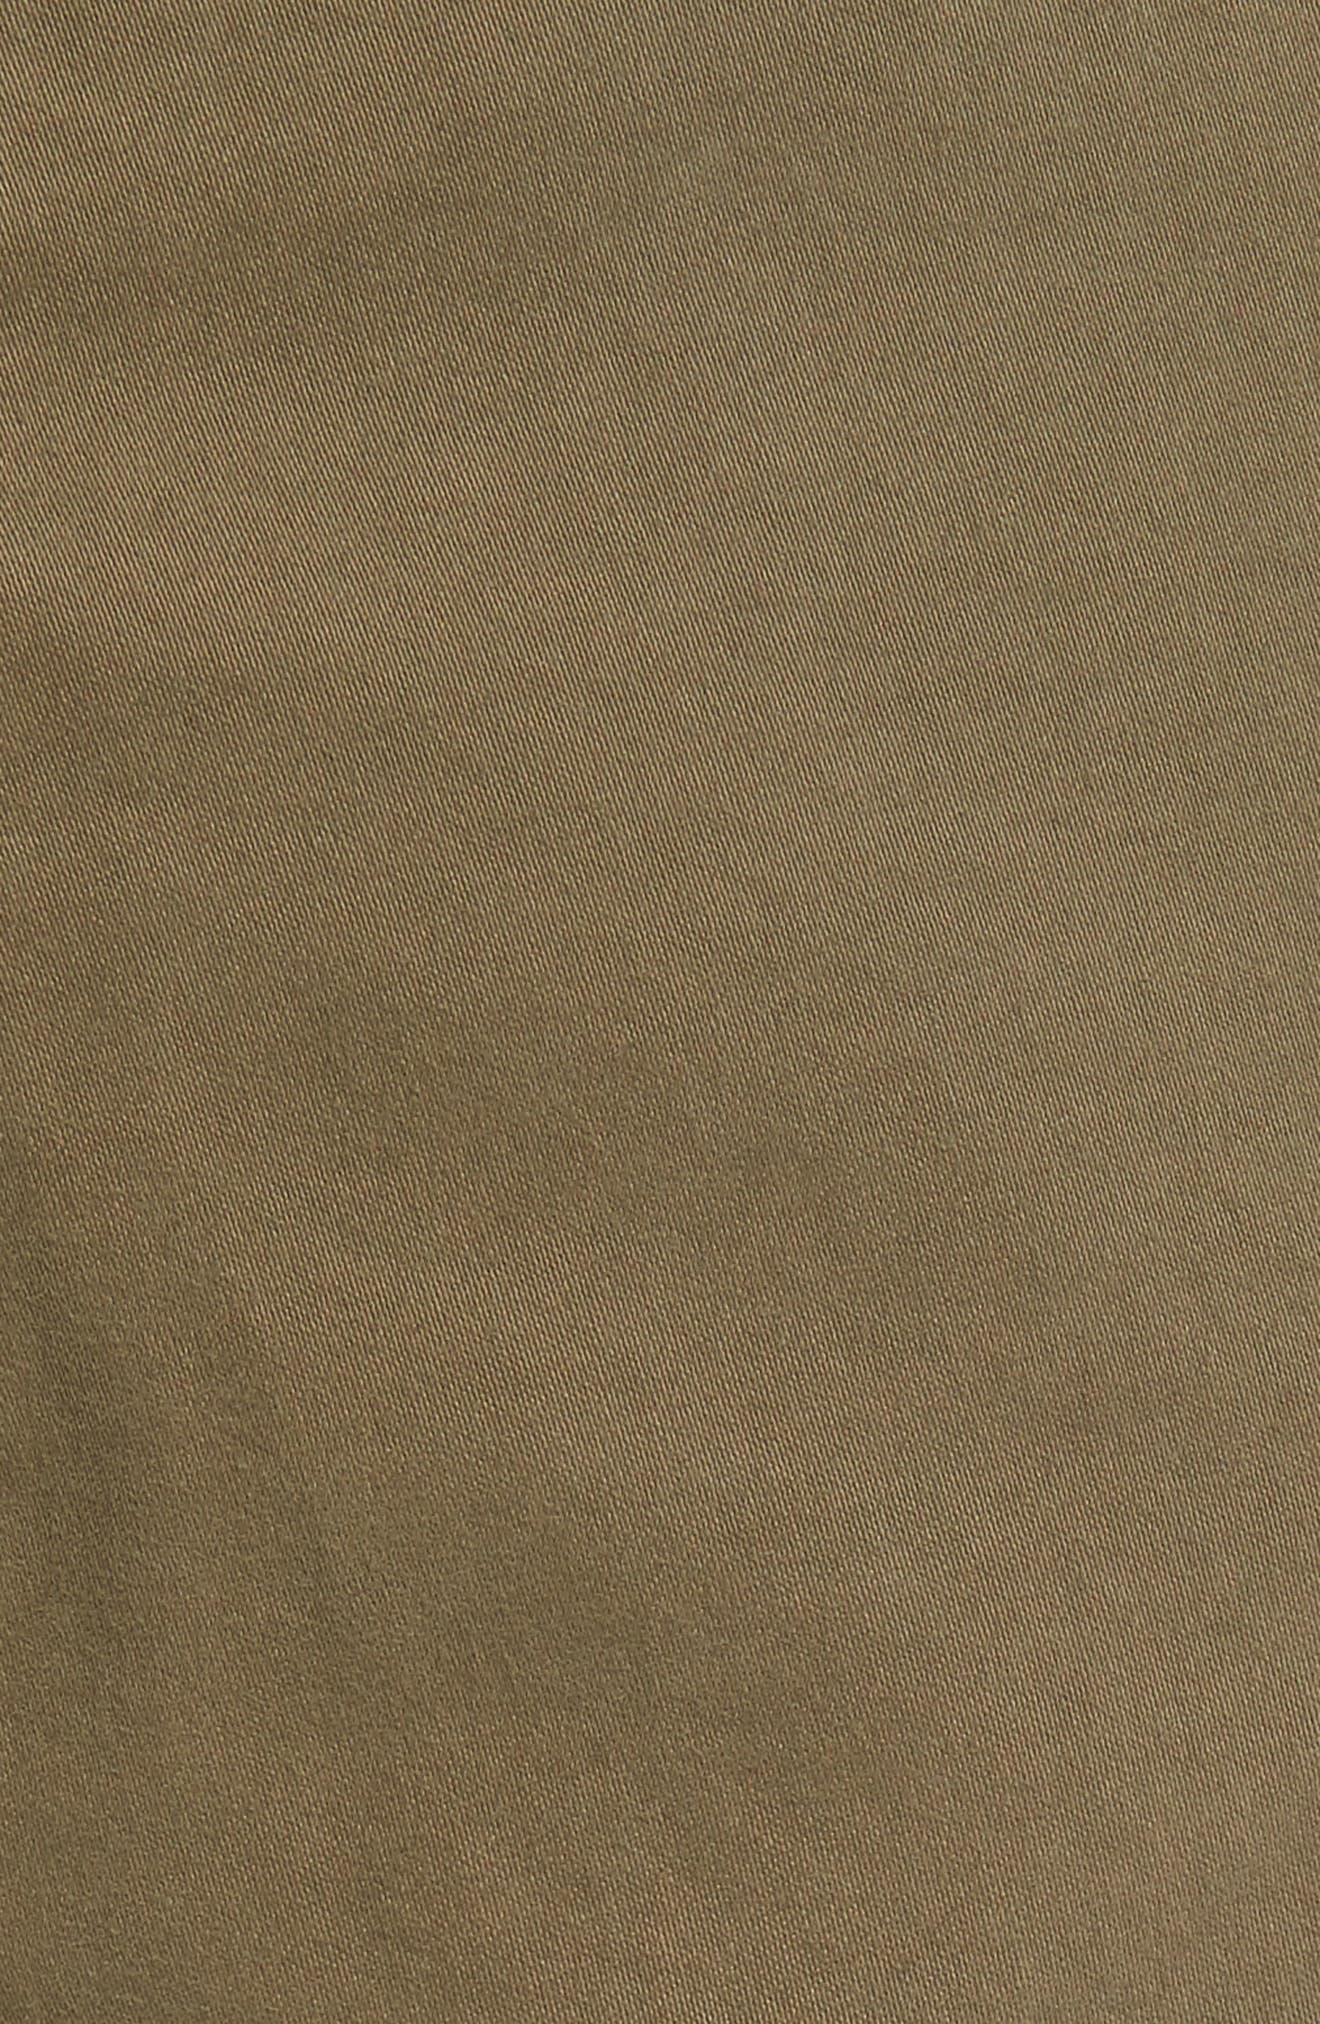 Graduate SUD Slim Straight Leg Pants,                             Alternate thumbnail 5, color,                             Caper Leaf